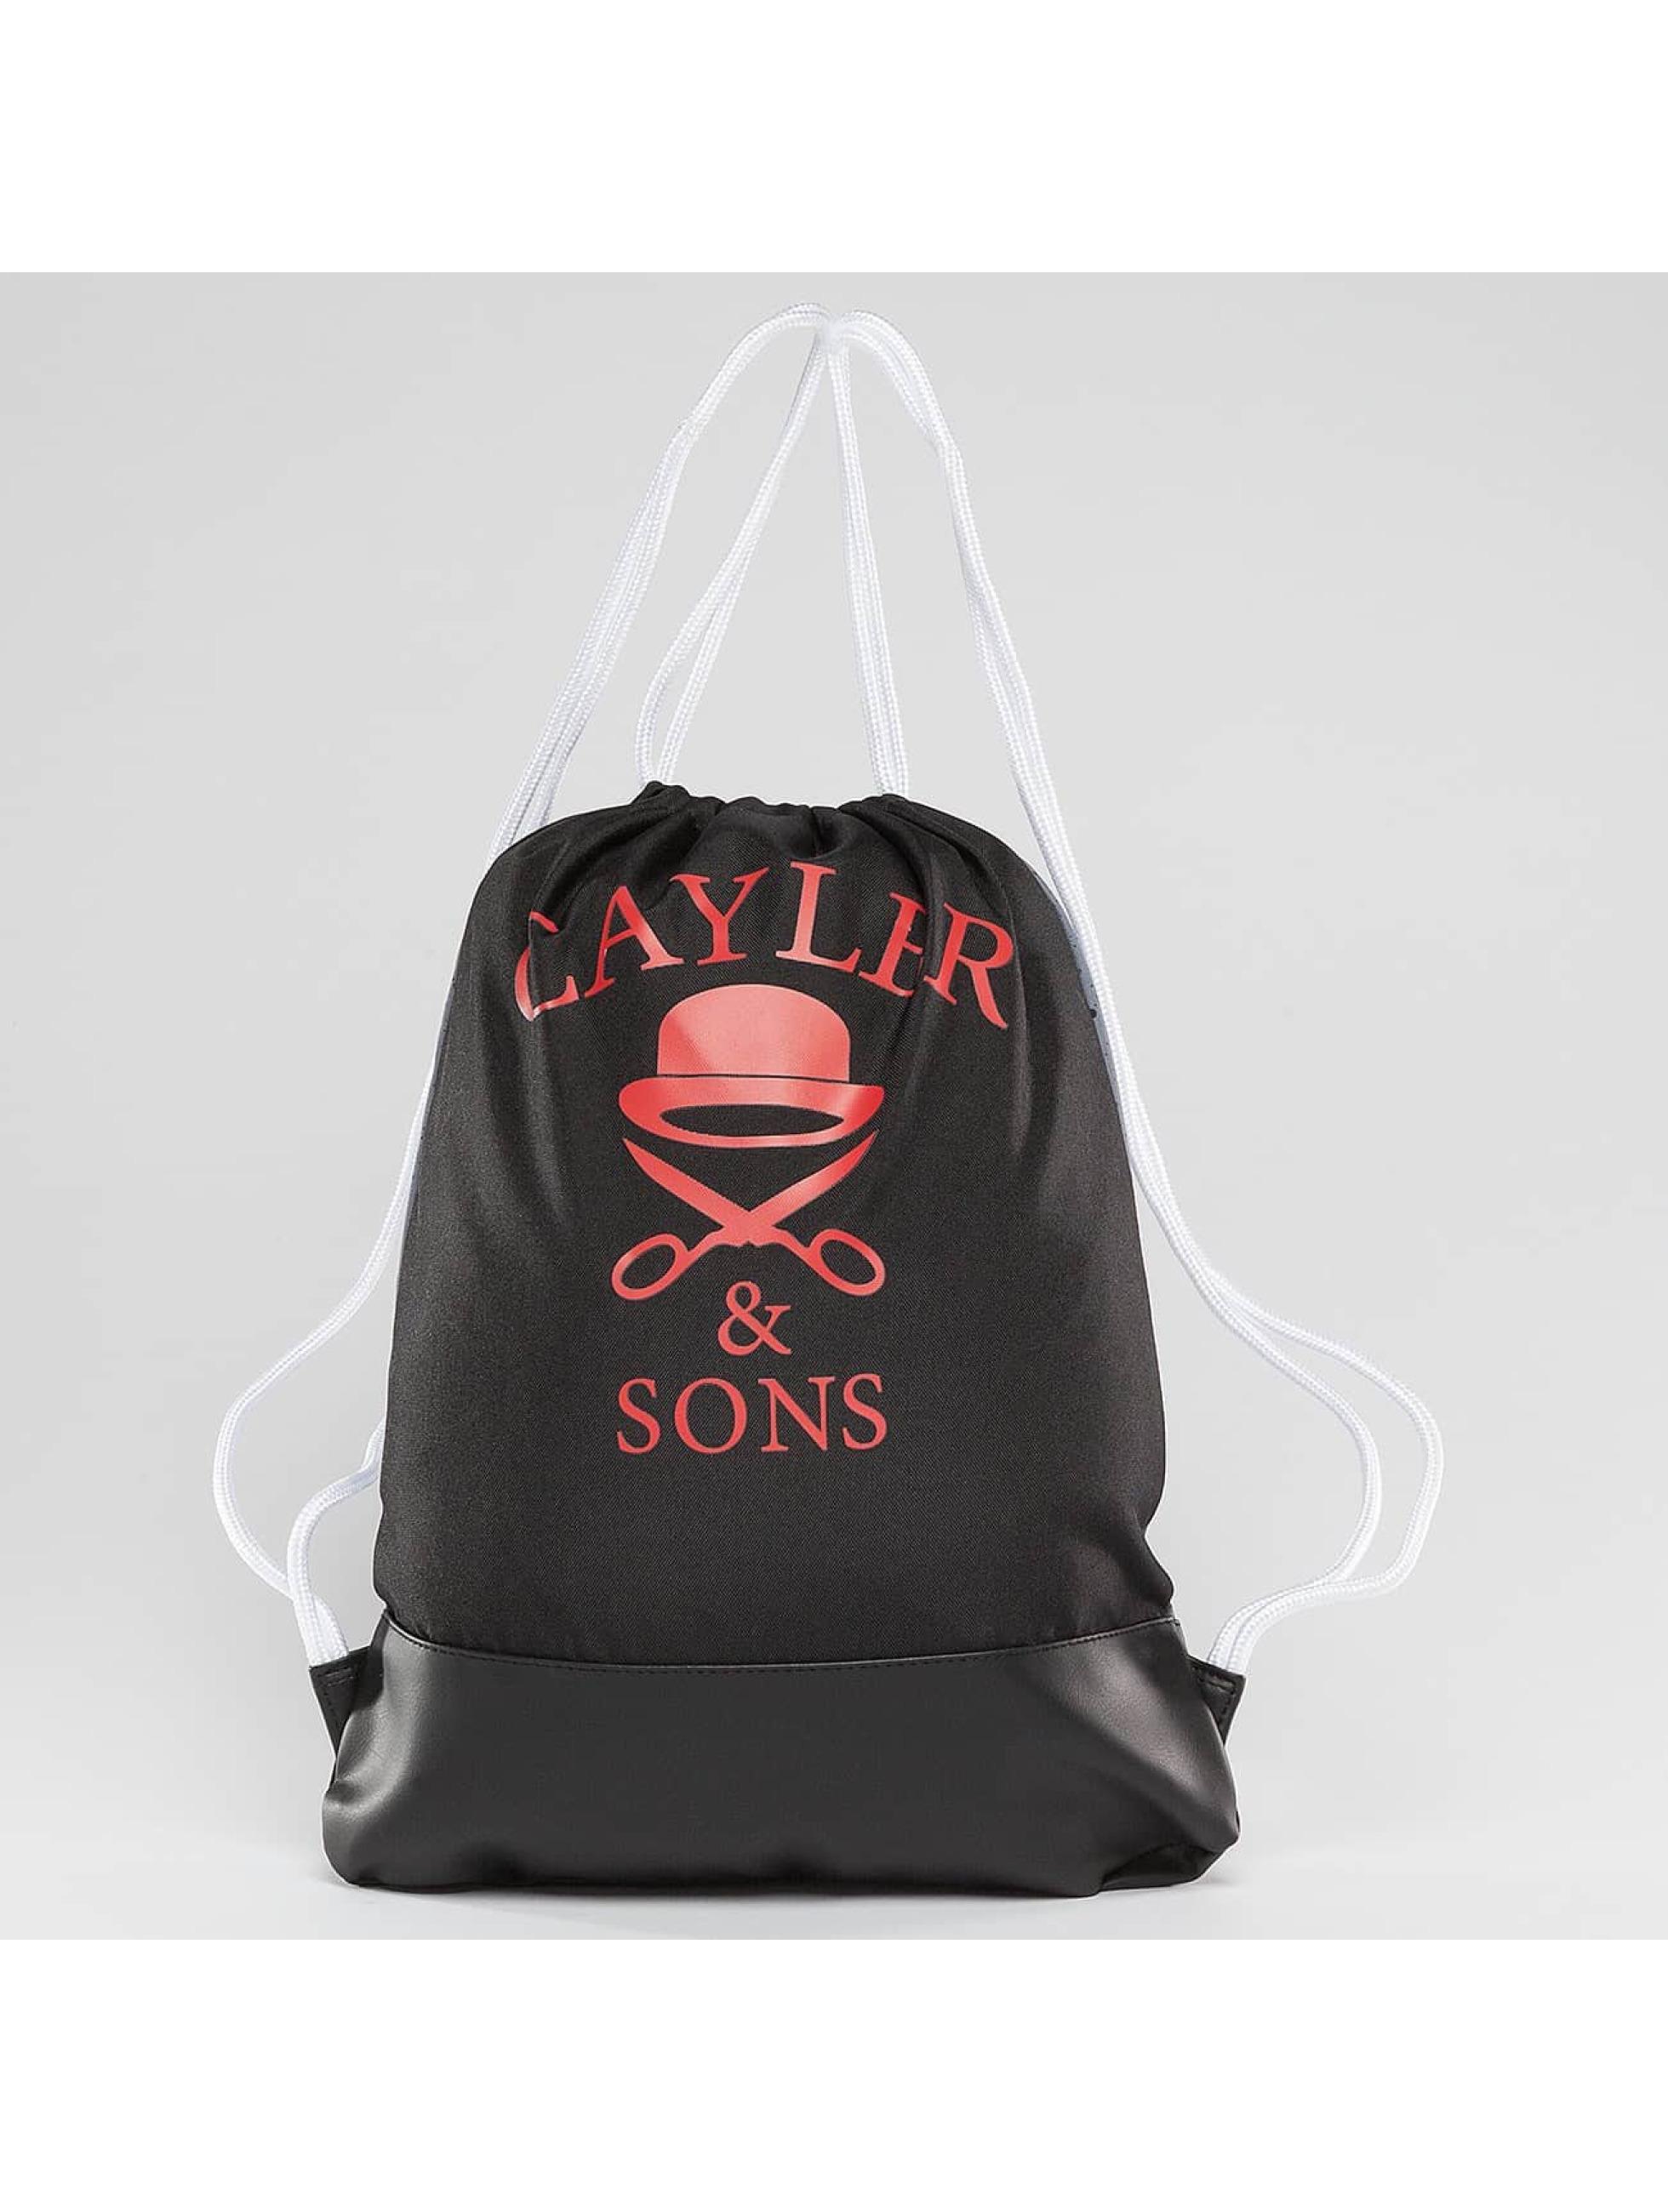 Cayler & Sons Beutel Trust grau